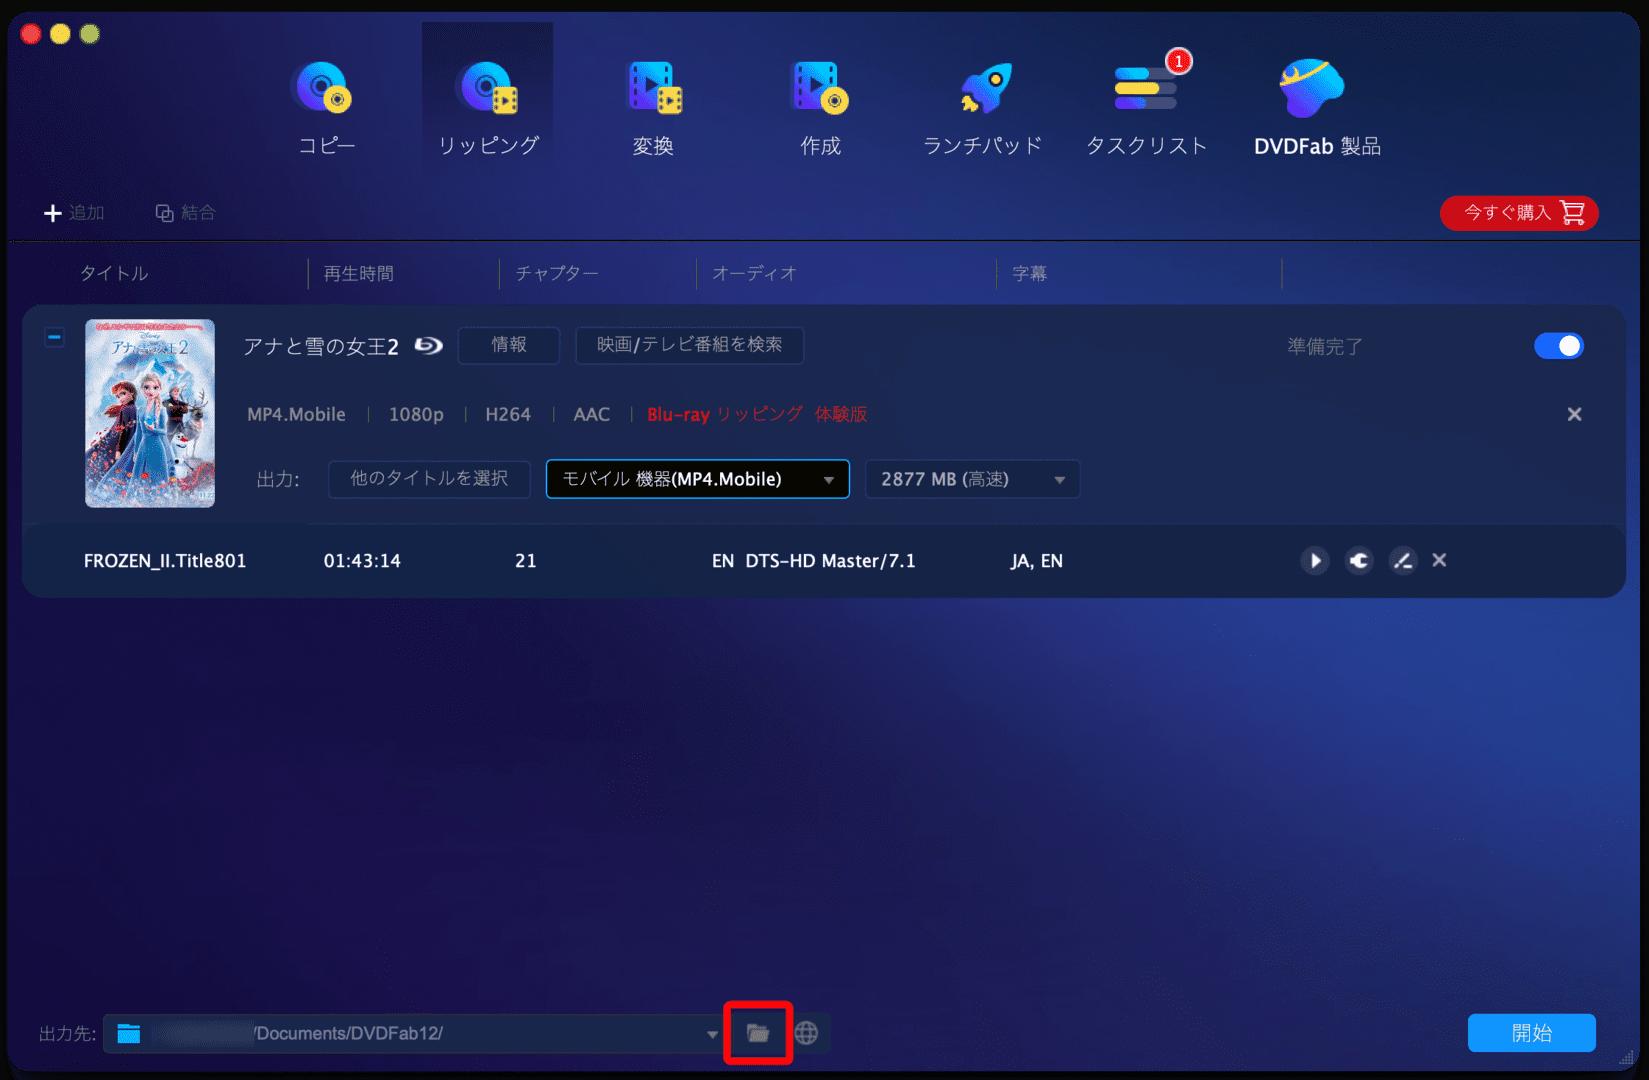 Mac版DVDFab12ブルーレイのコピー方法|無料でコピーガード解除してMacに取り込む!セル&レンタル・地上波番組を録画したブルーレイをコピーする方法|ISOファイルをiPhoneに適した形式に変換する:操作画面下部にあるフォルダアイコンをクリックしてリッピングする動画ファイルの保存先を指定しましょう。